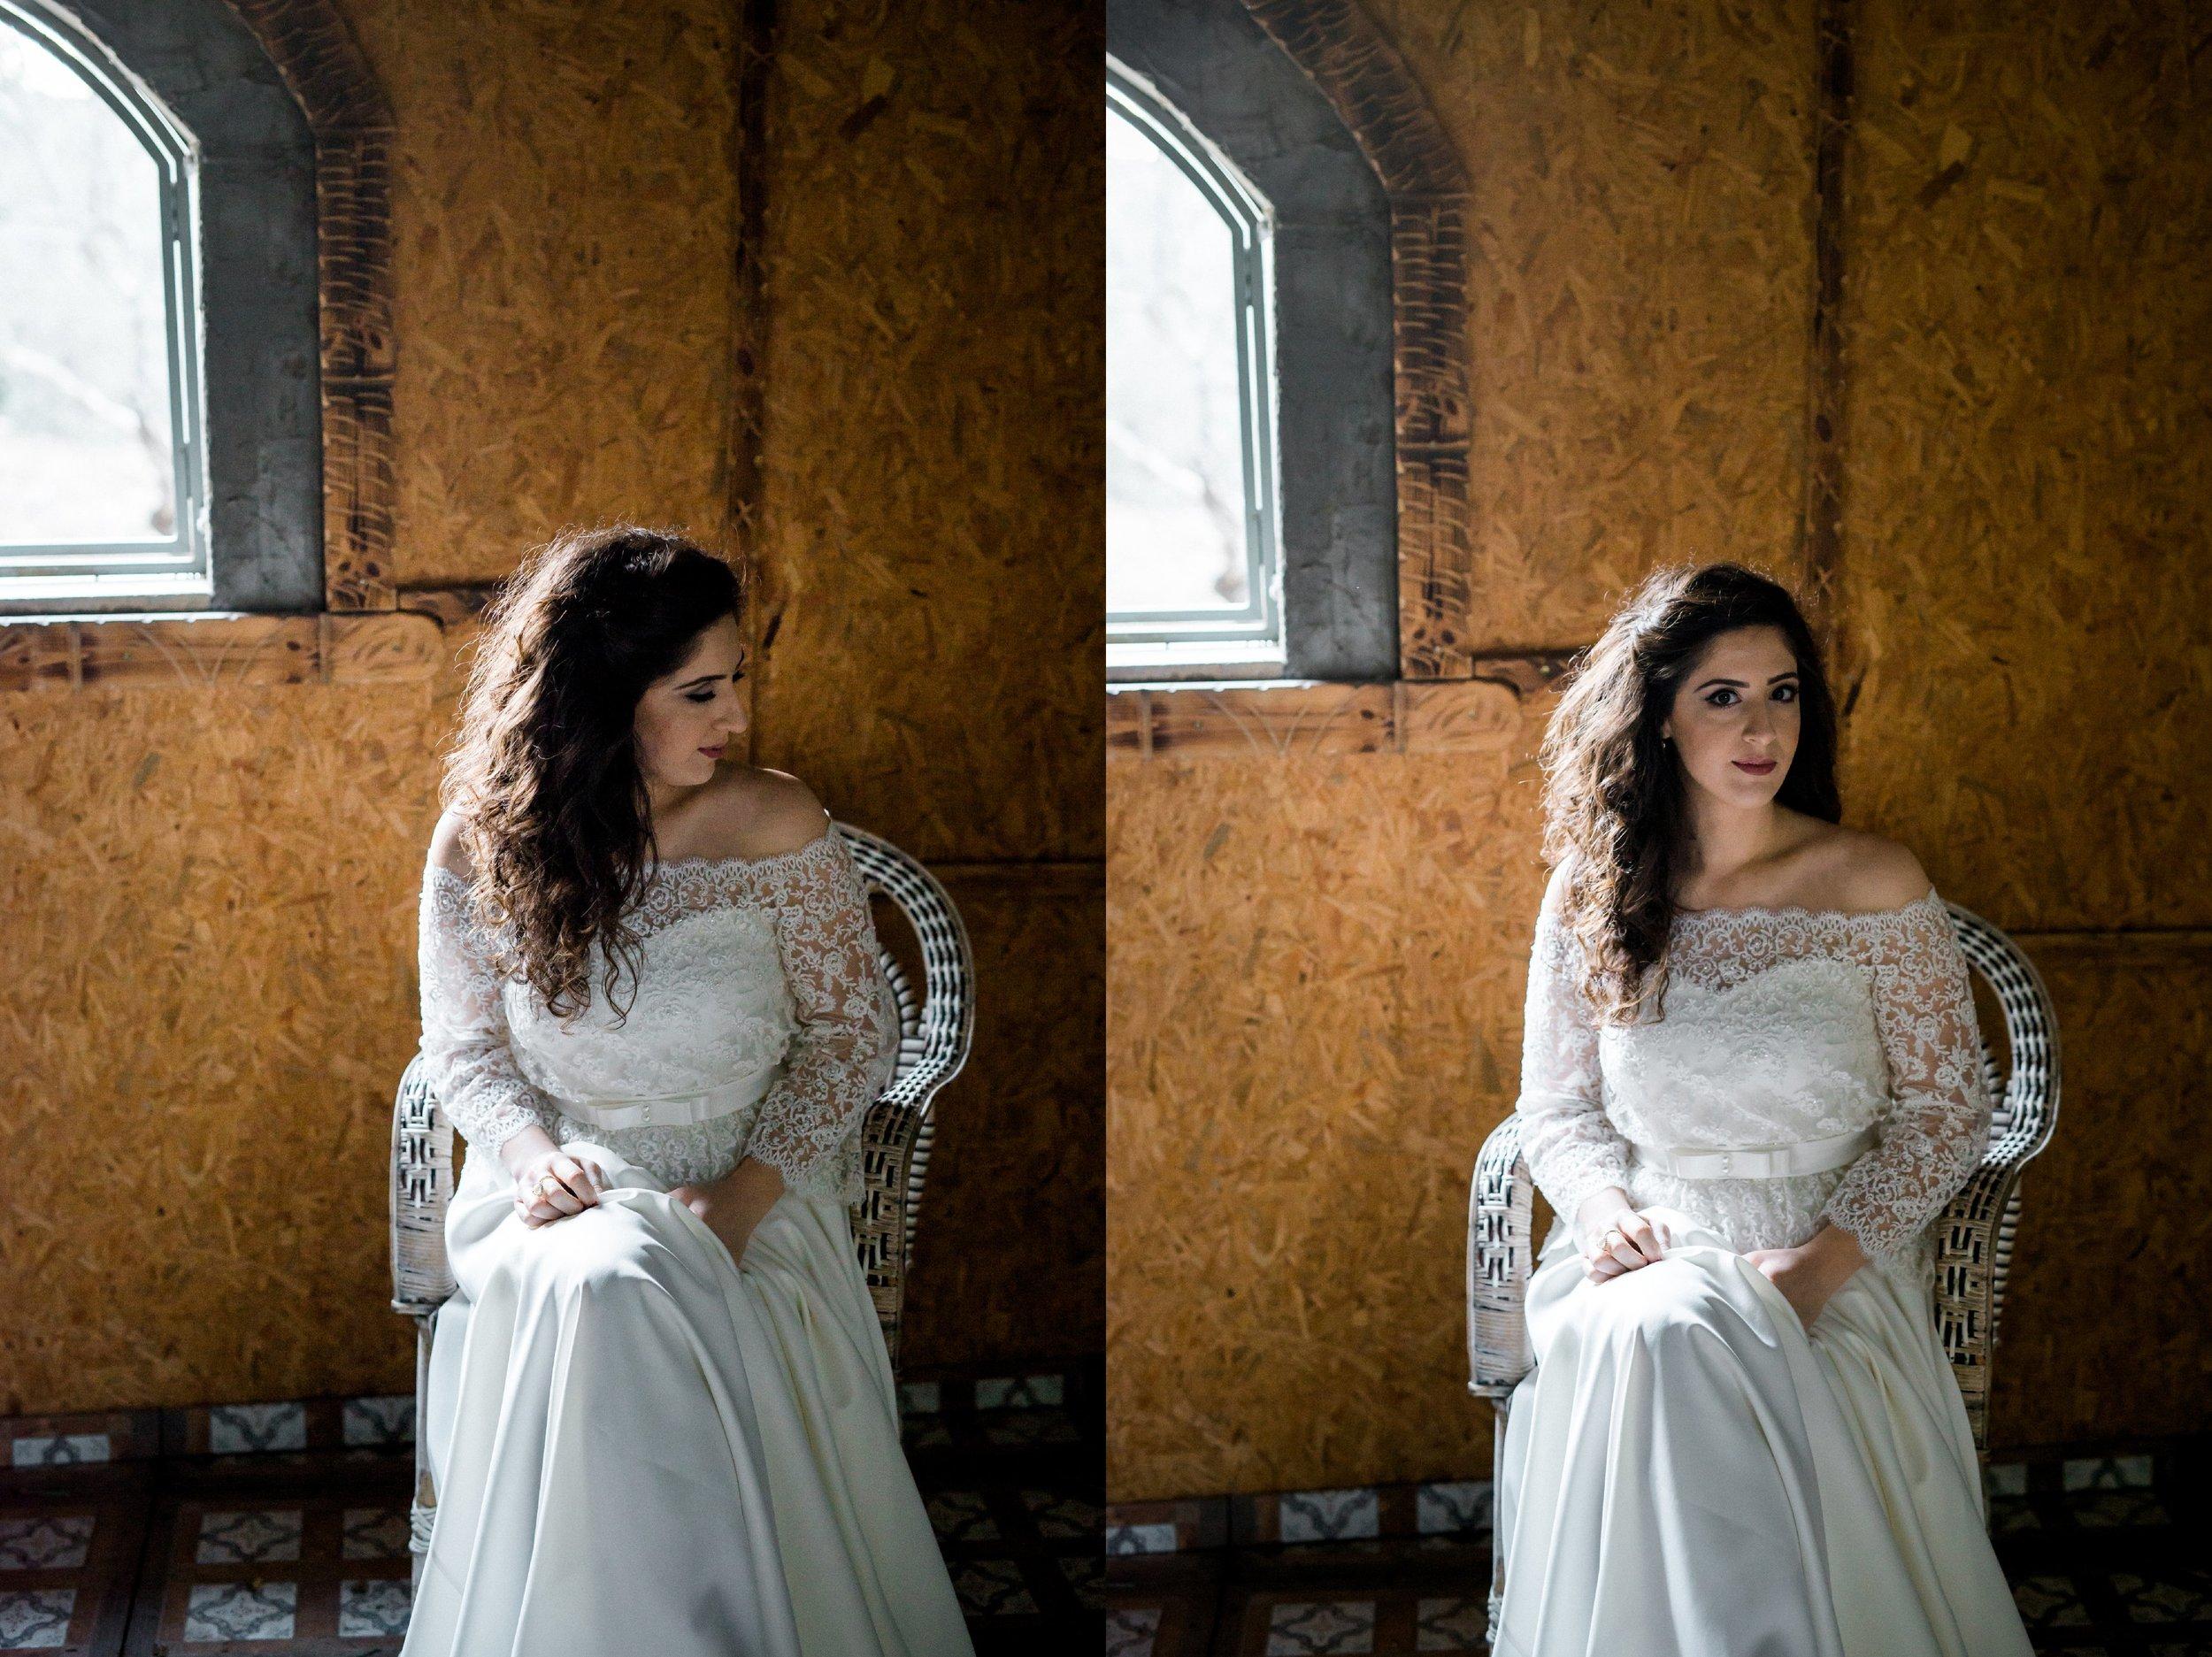 israel-garden-wedding-portraits-session-kate-giryes-photography--41_WEB.jpg